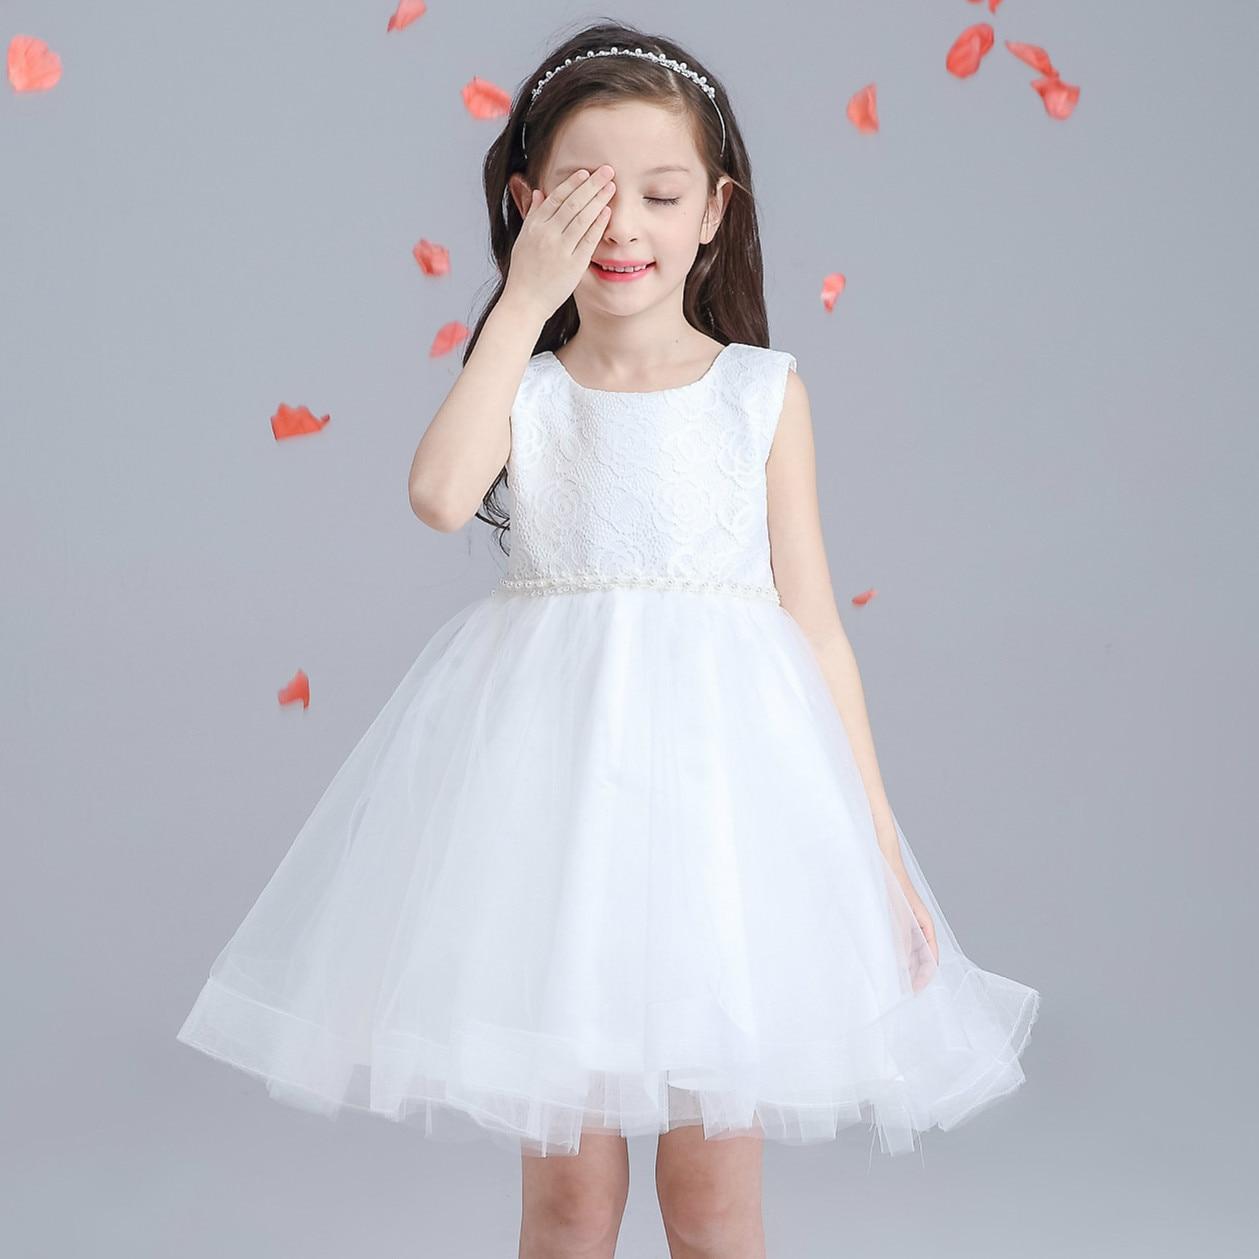 wedding dress white flower girl princess vestidos party wear costume